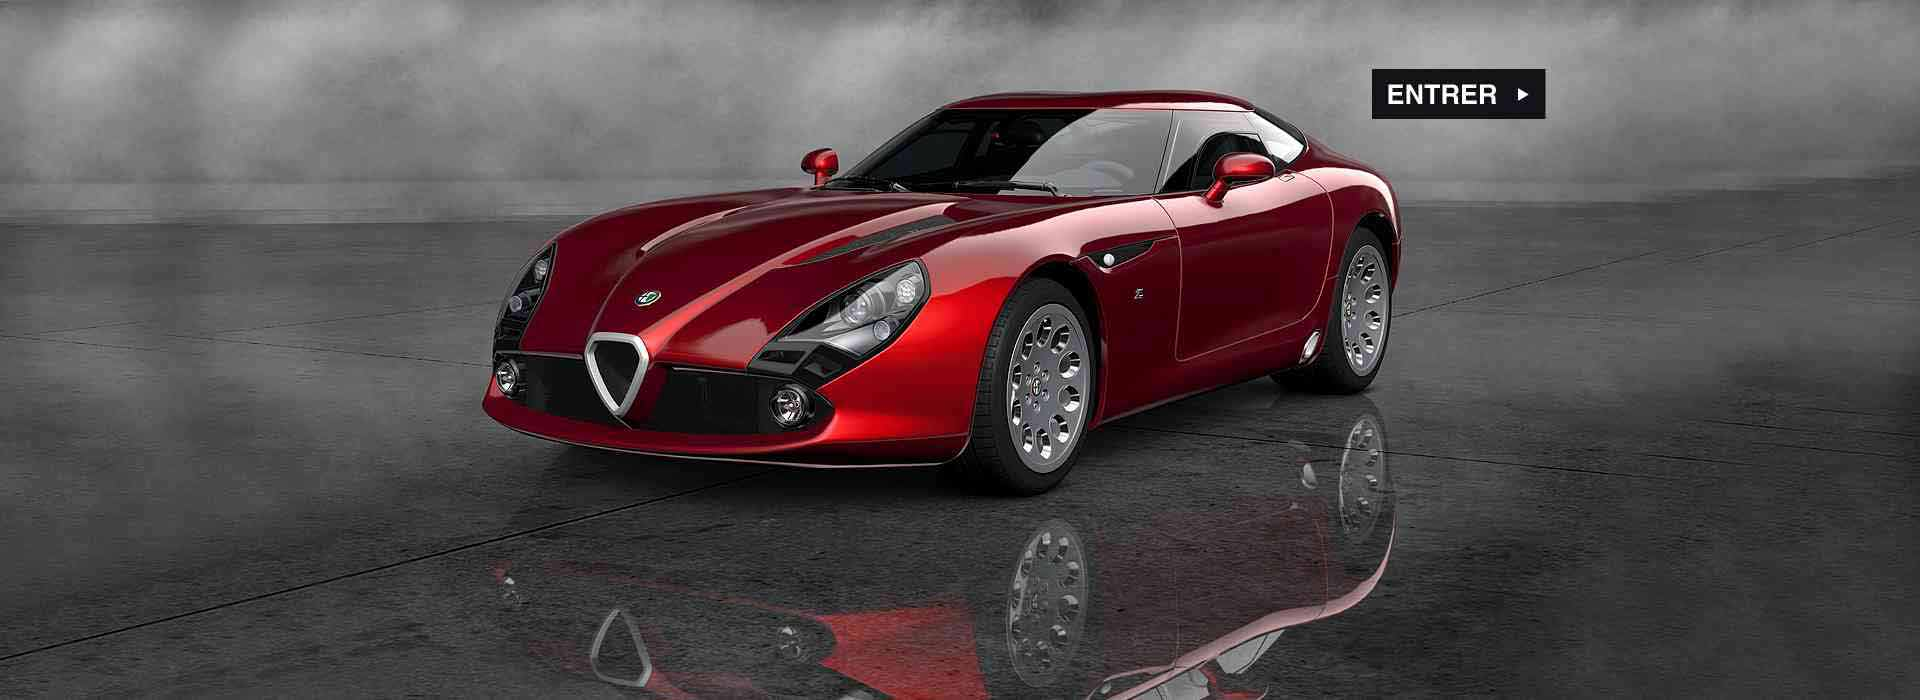 Alfa_Romeo_Mulhouse_MainBanner